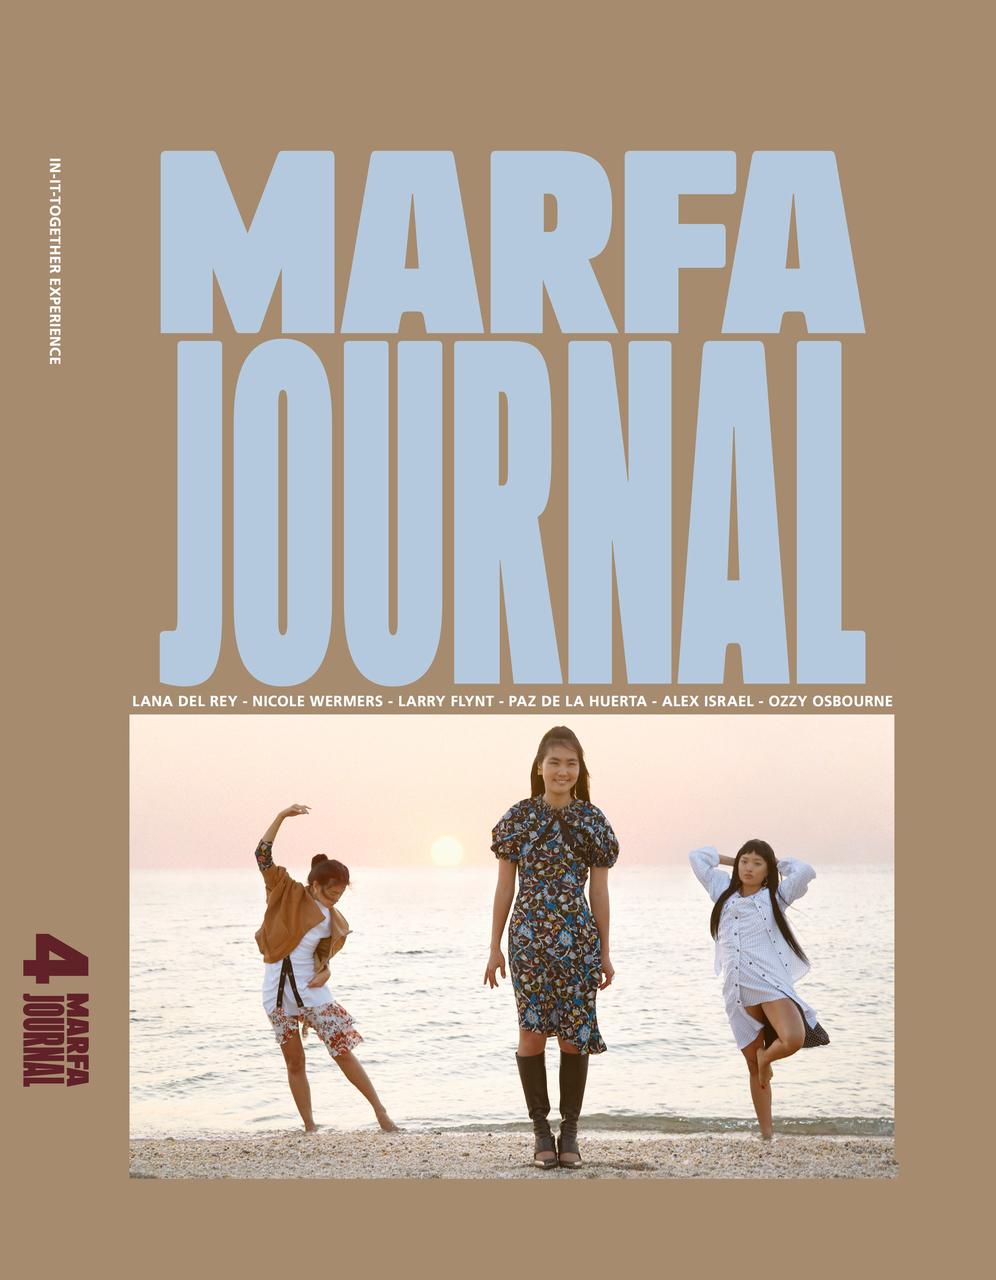 Marfa_4_cover_asians_v2